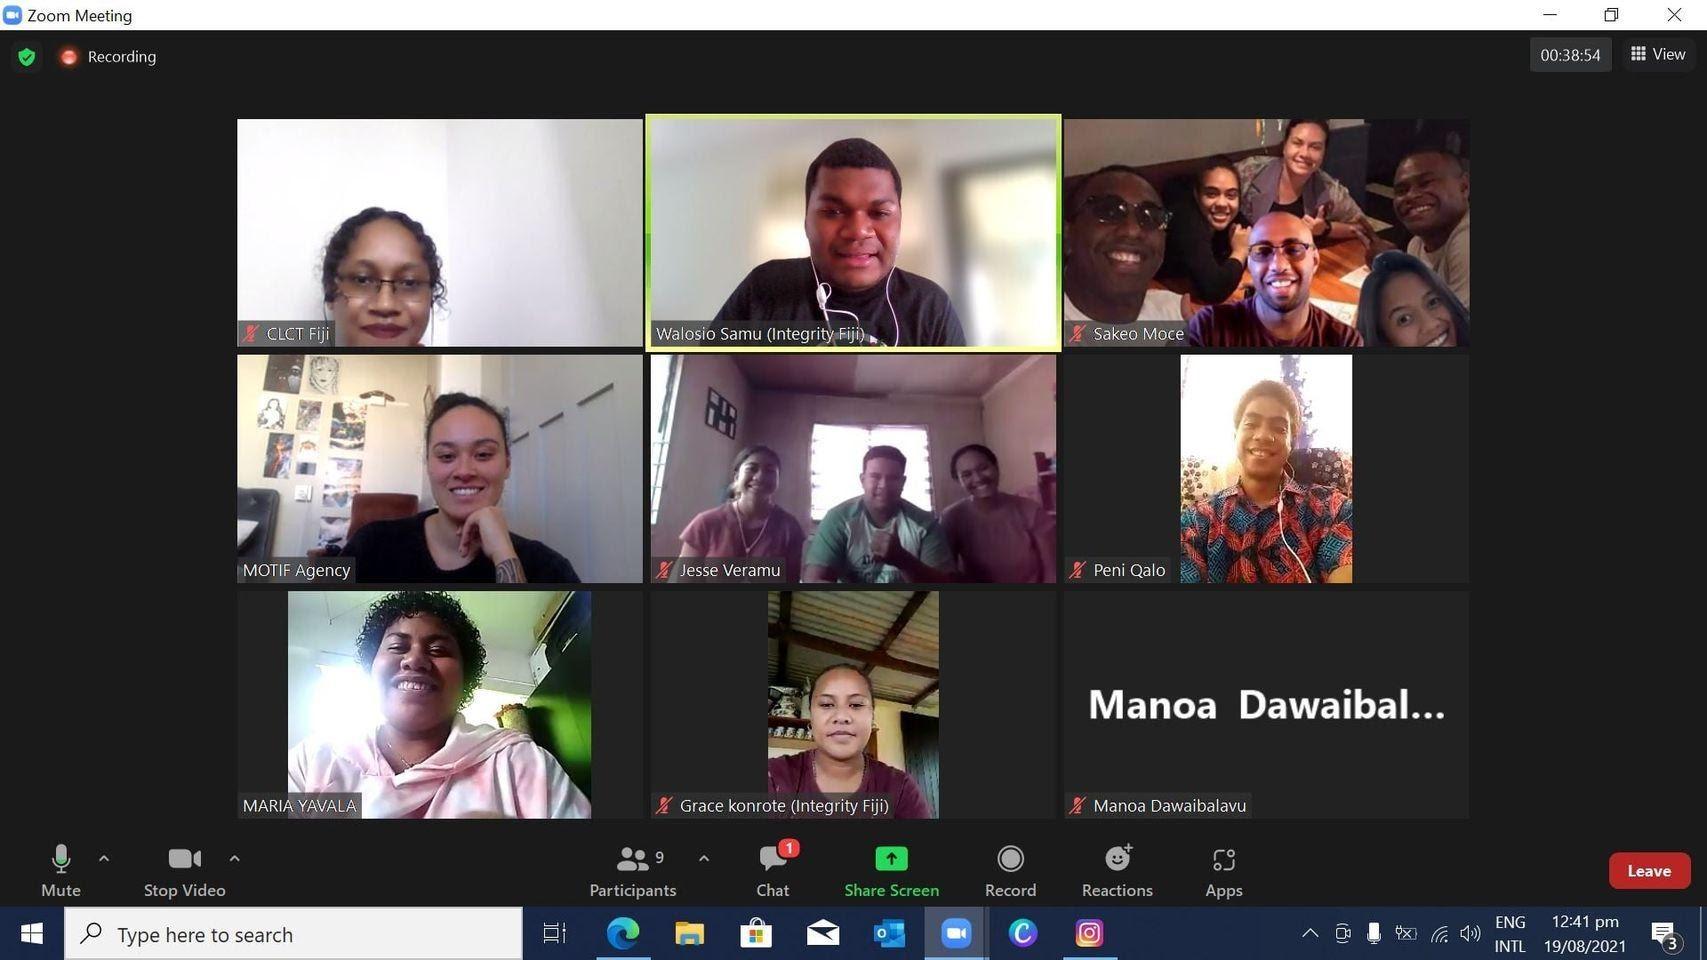 May be an image of 14 people, including Maria Yavala, Chelsea Cain, Samu Walosio and Sakeo Moceinacama Ravesi, screen and text